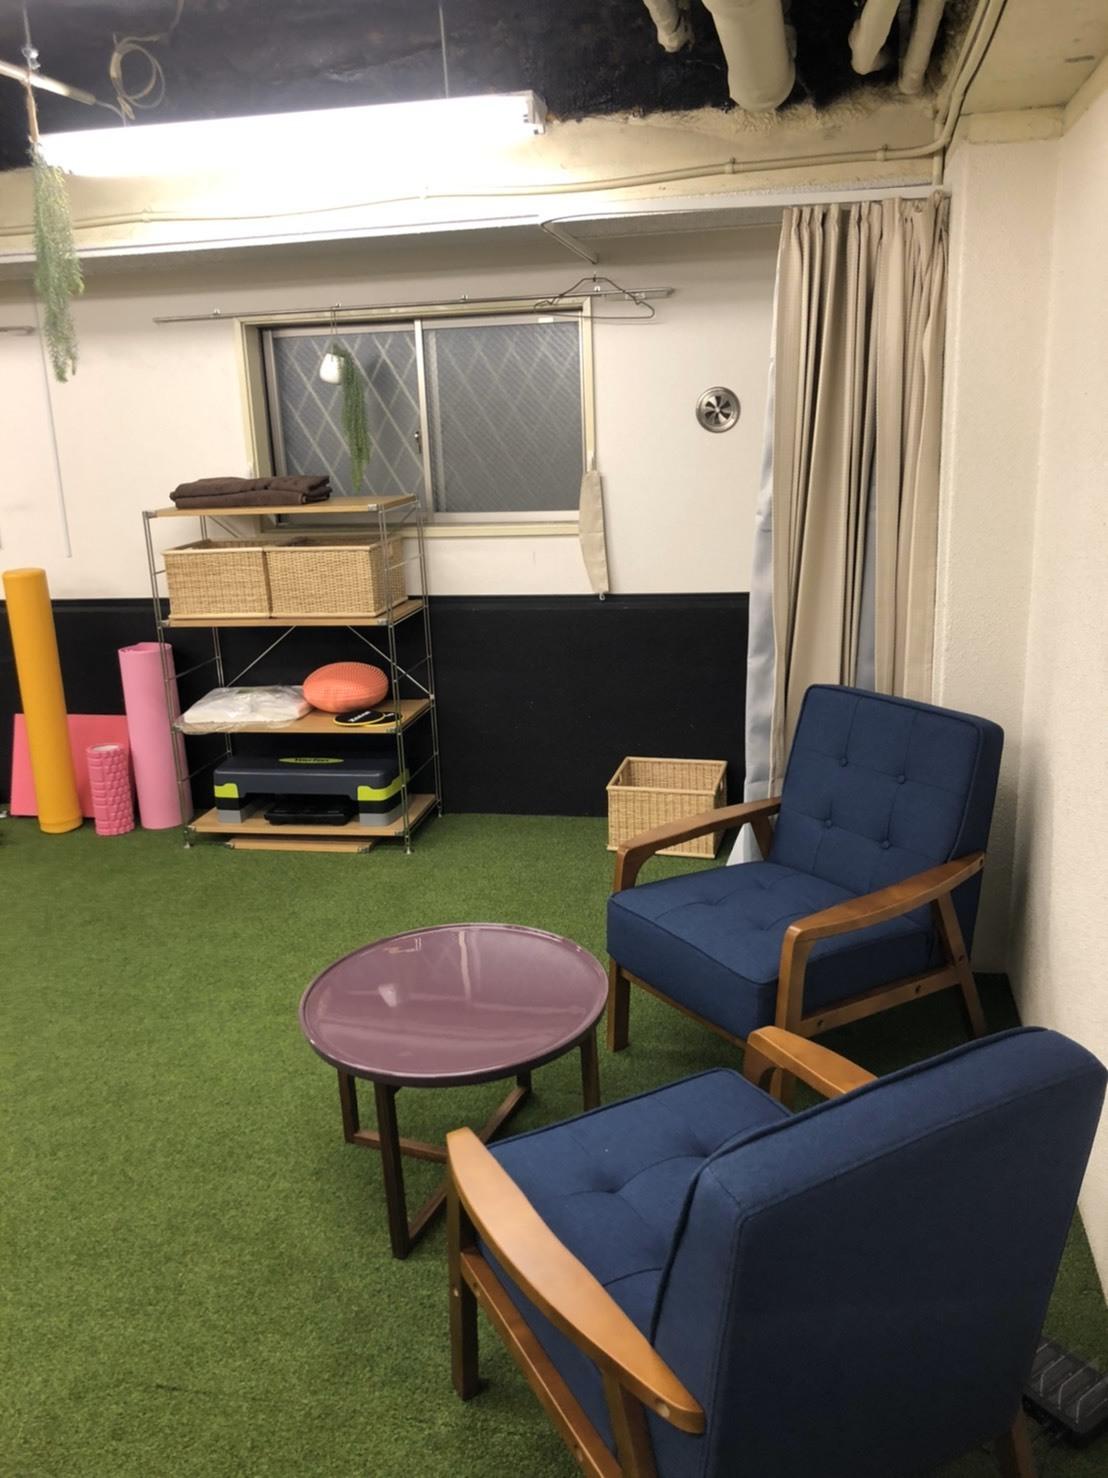 LiMEレンタルジム 新中野 レンタルジムの室内の写真